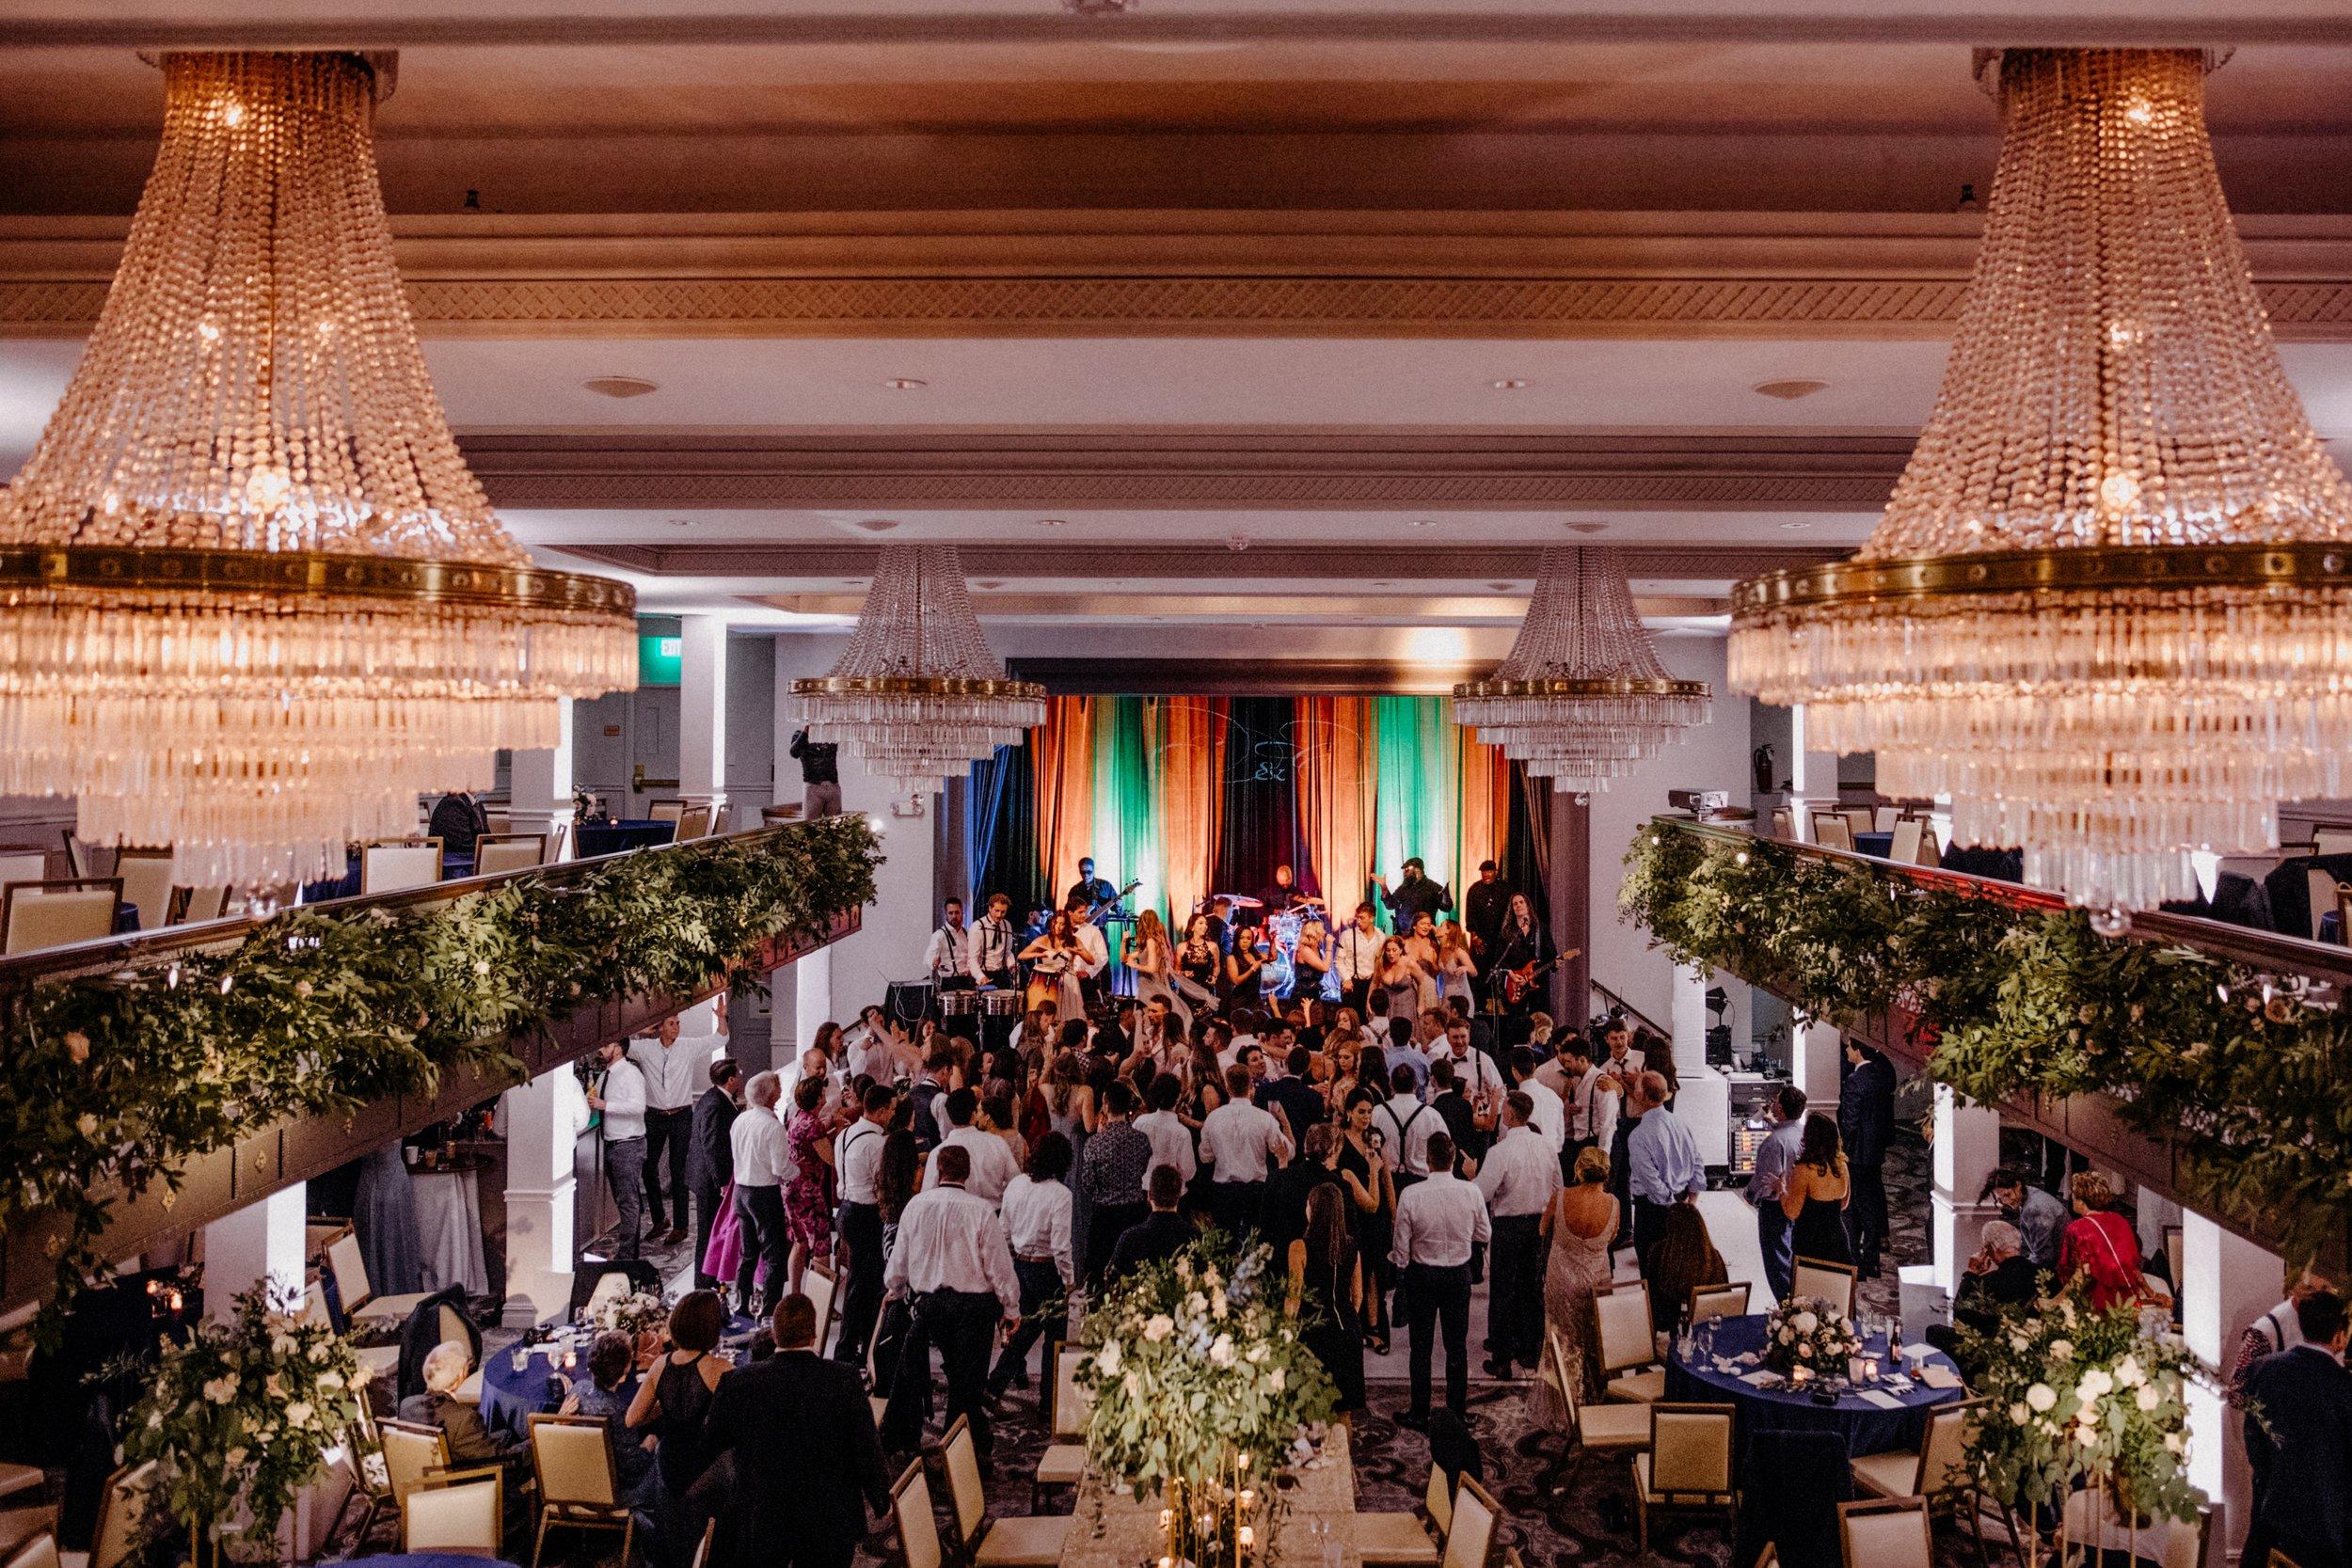 st-anthony-hotel-wedding-photography-10204san-antonio.JPG